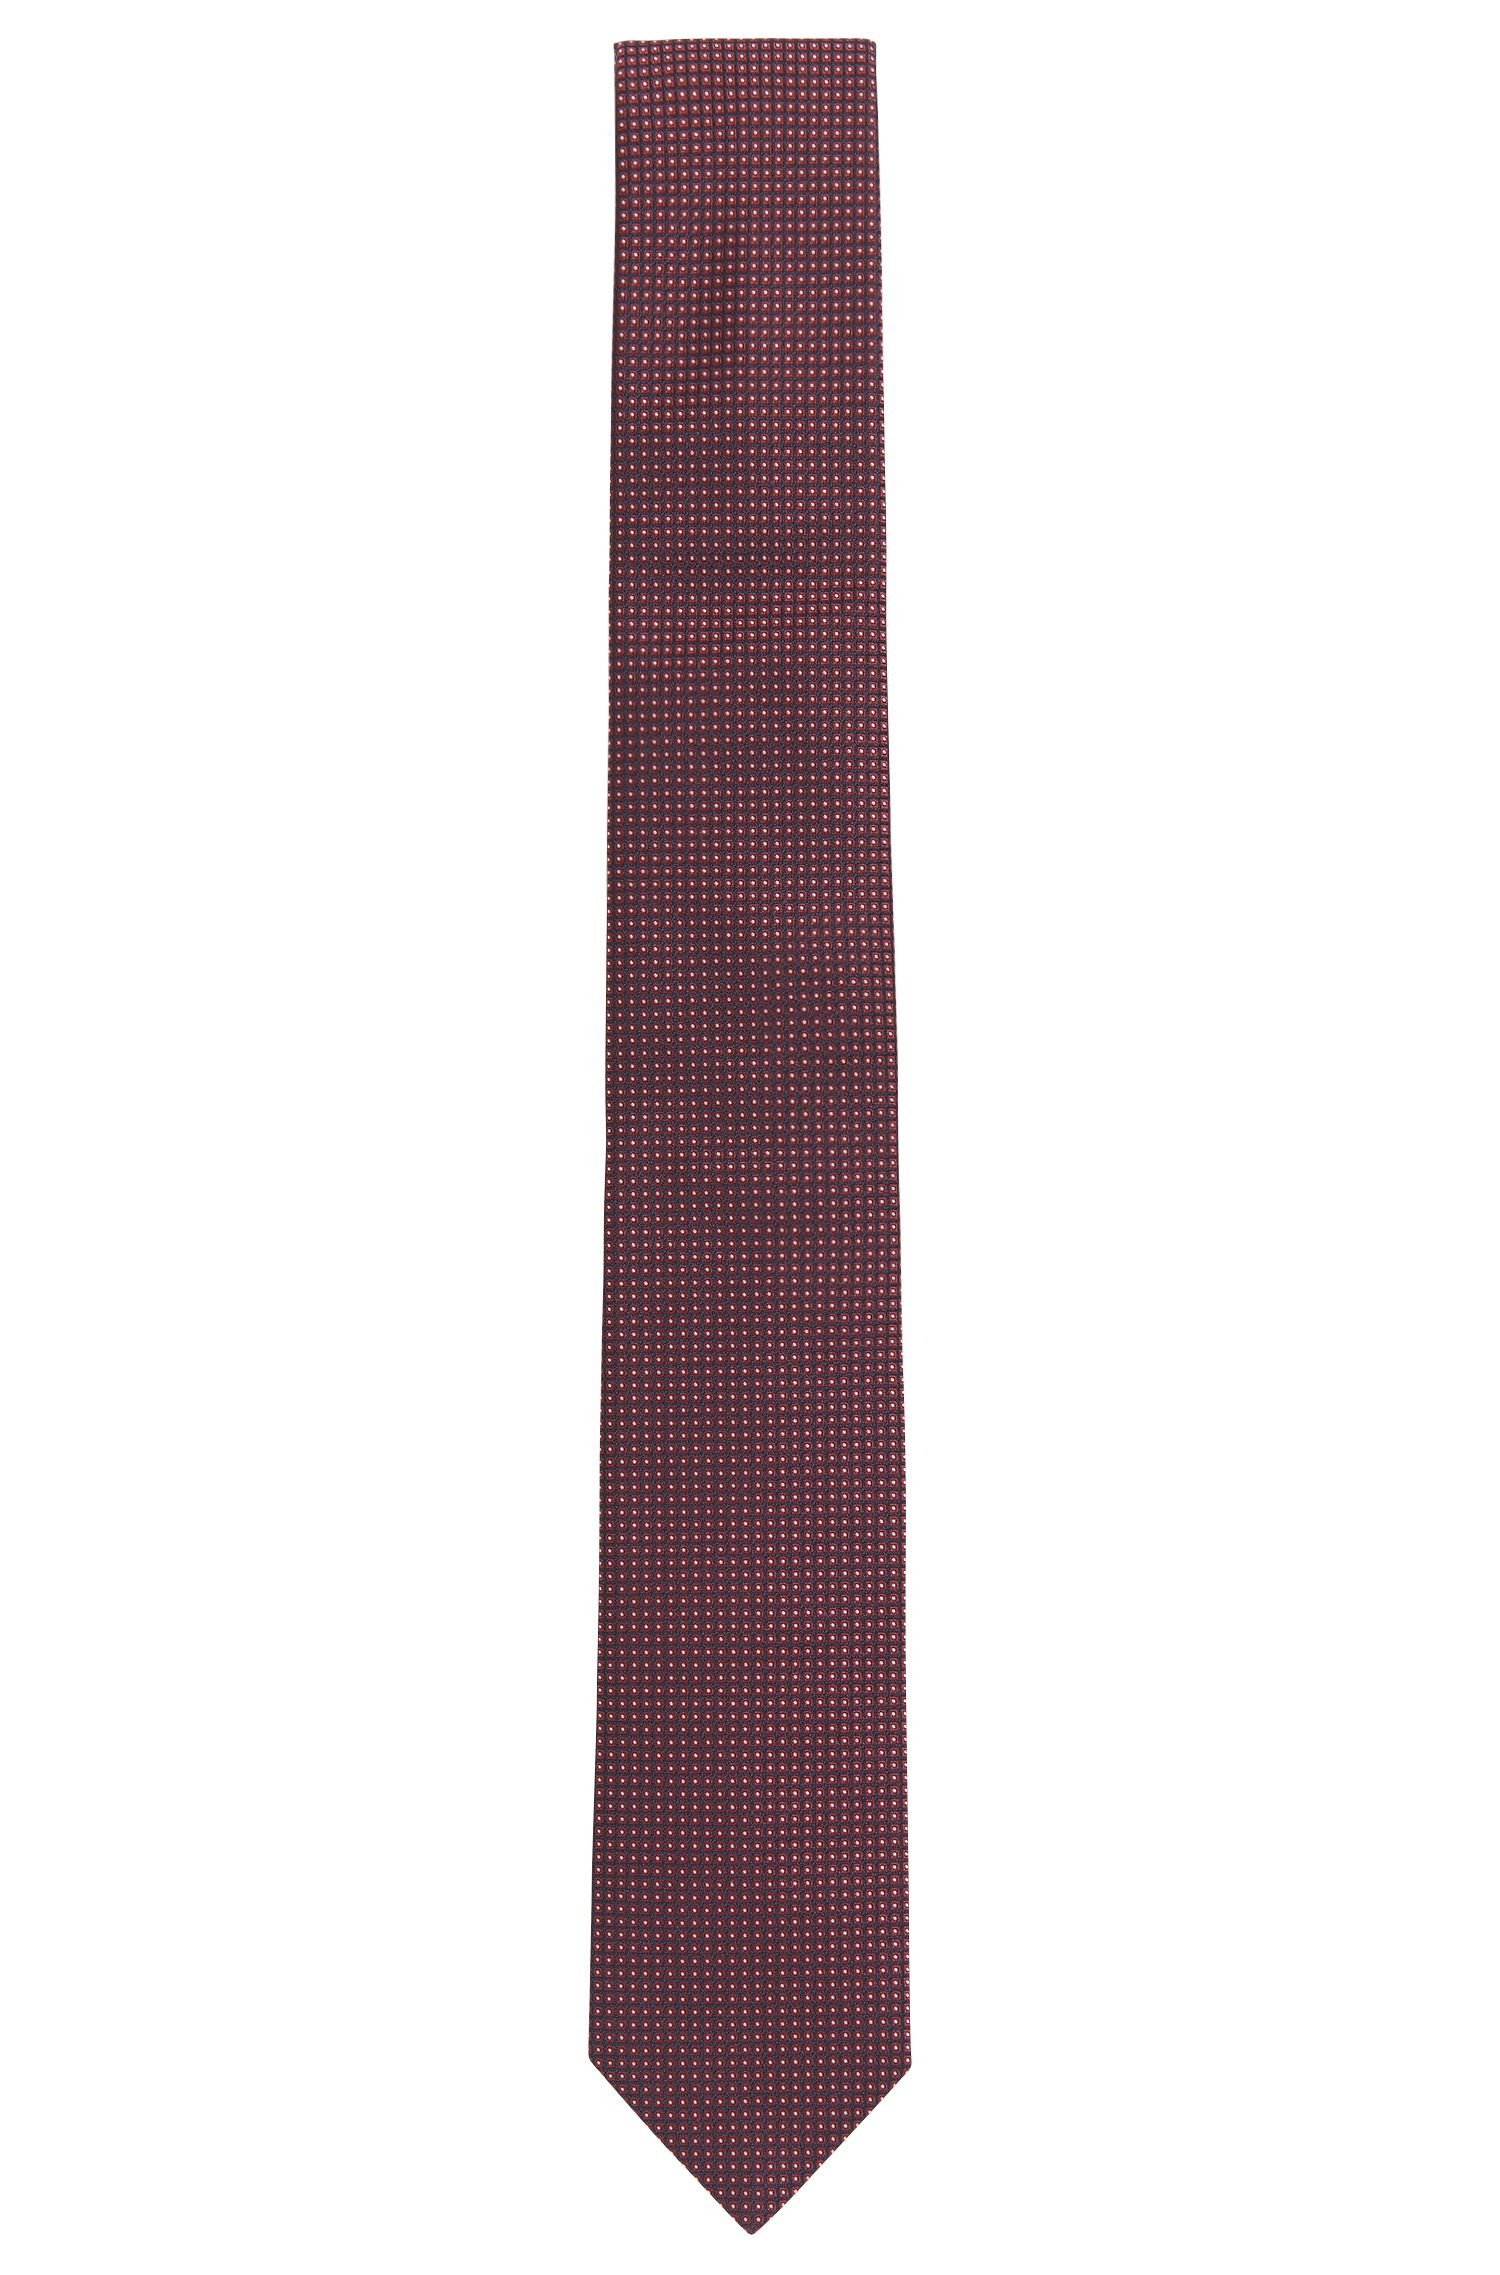 Karierte Krawatte aus Seiden-Jacquard